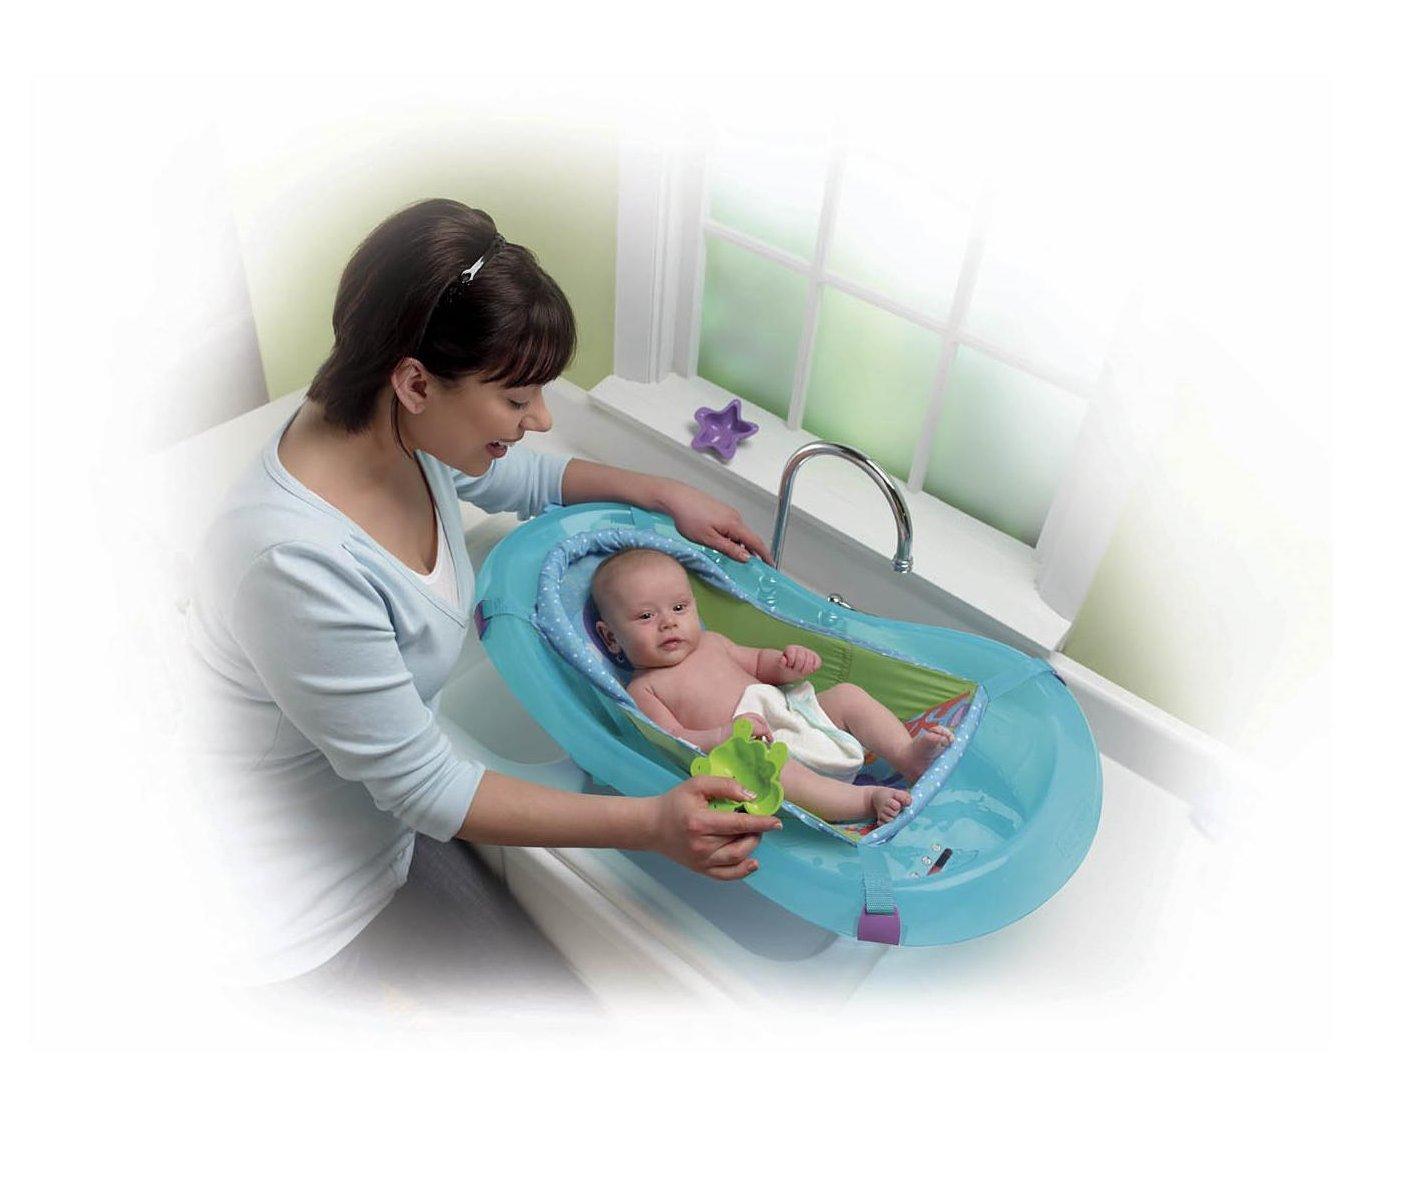 Wonderful Tub Paint Small Paint Bathtub Flat Bath Refinishing Service Paint A Bathtub Youthful Bathtub Refinishing Company Pink Can You Paint A Tub